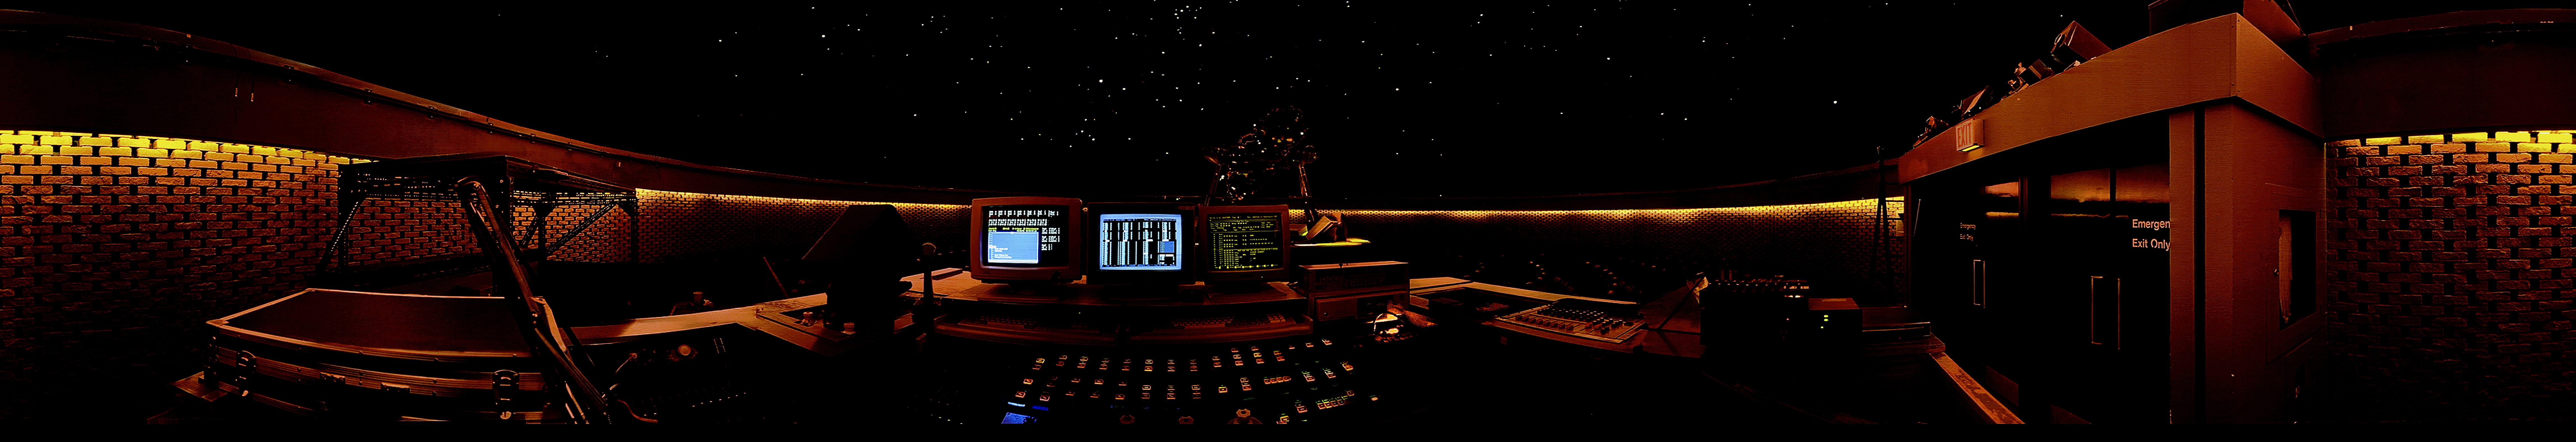 File:McLaughlin Planetarium Star Theatre 360 Panorama.jpg - Wikimedia ...